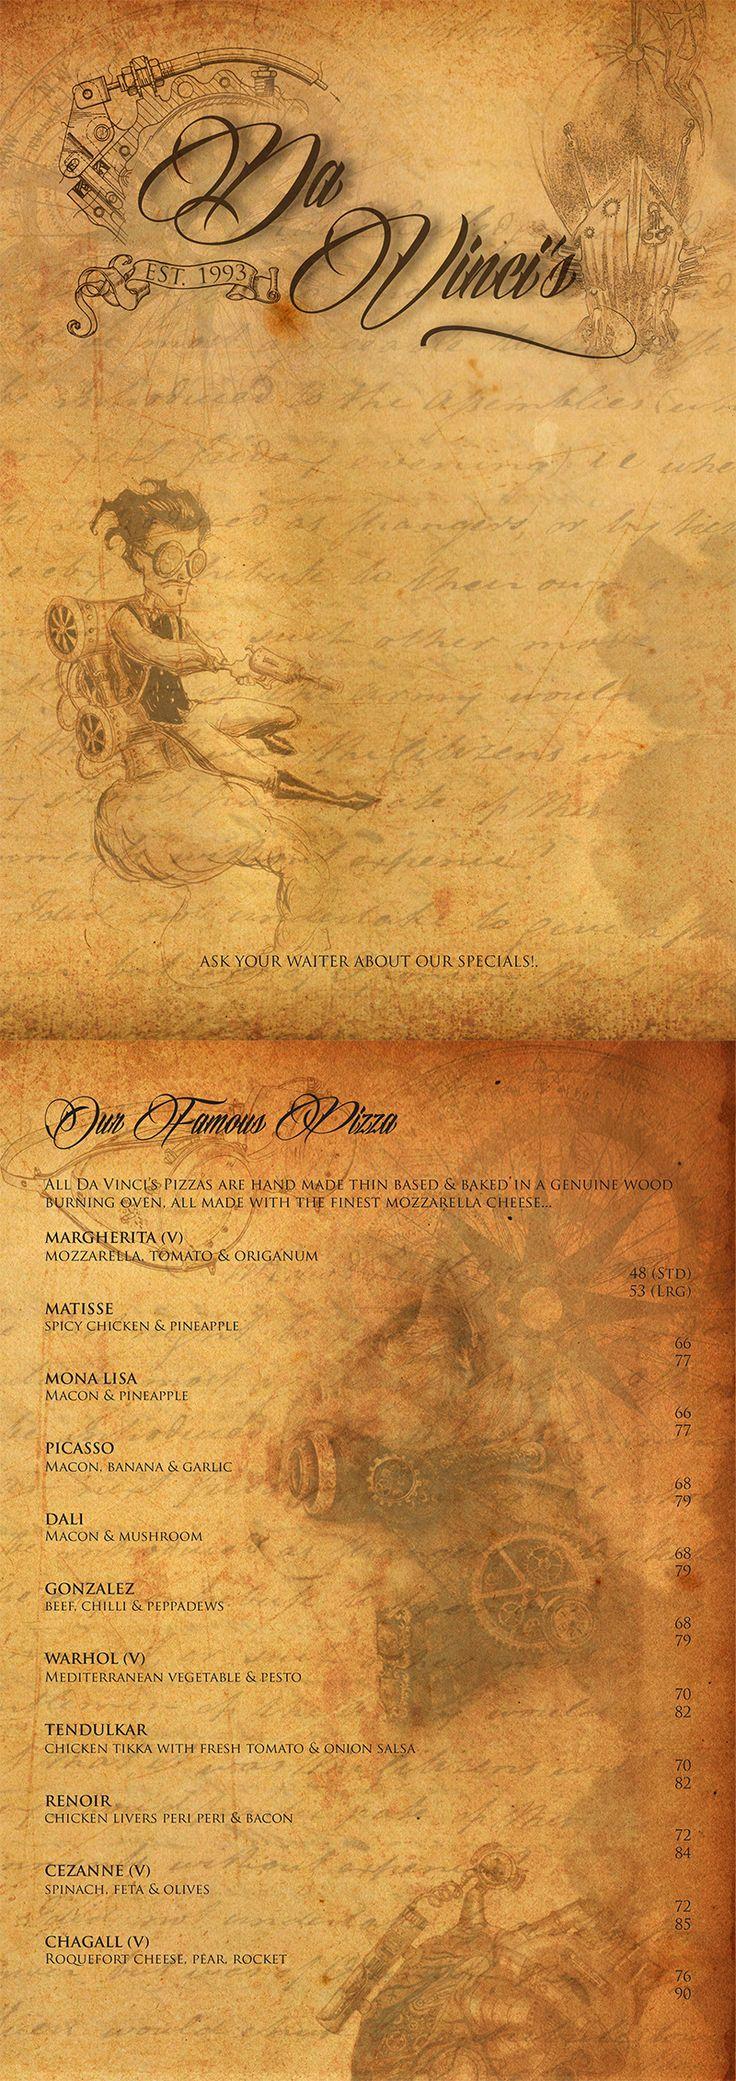 Class: 1 Year Print Design & Publishing || Name: Tashreeq Barday || Year: 2013 || Recreate your favorite restaurants menu. http://friendsofdesign.net/1-year-print-design-publishing